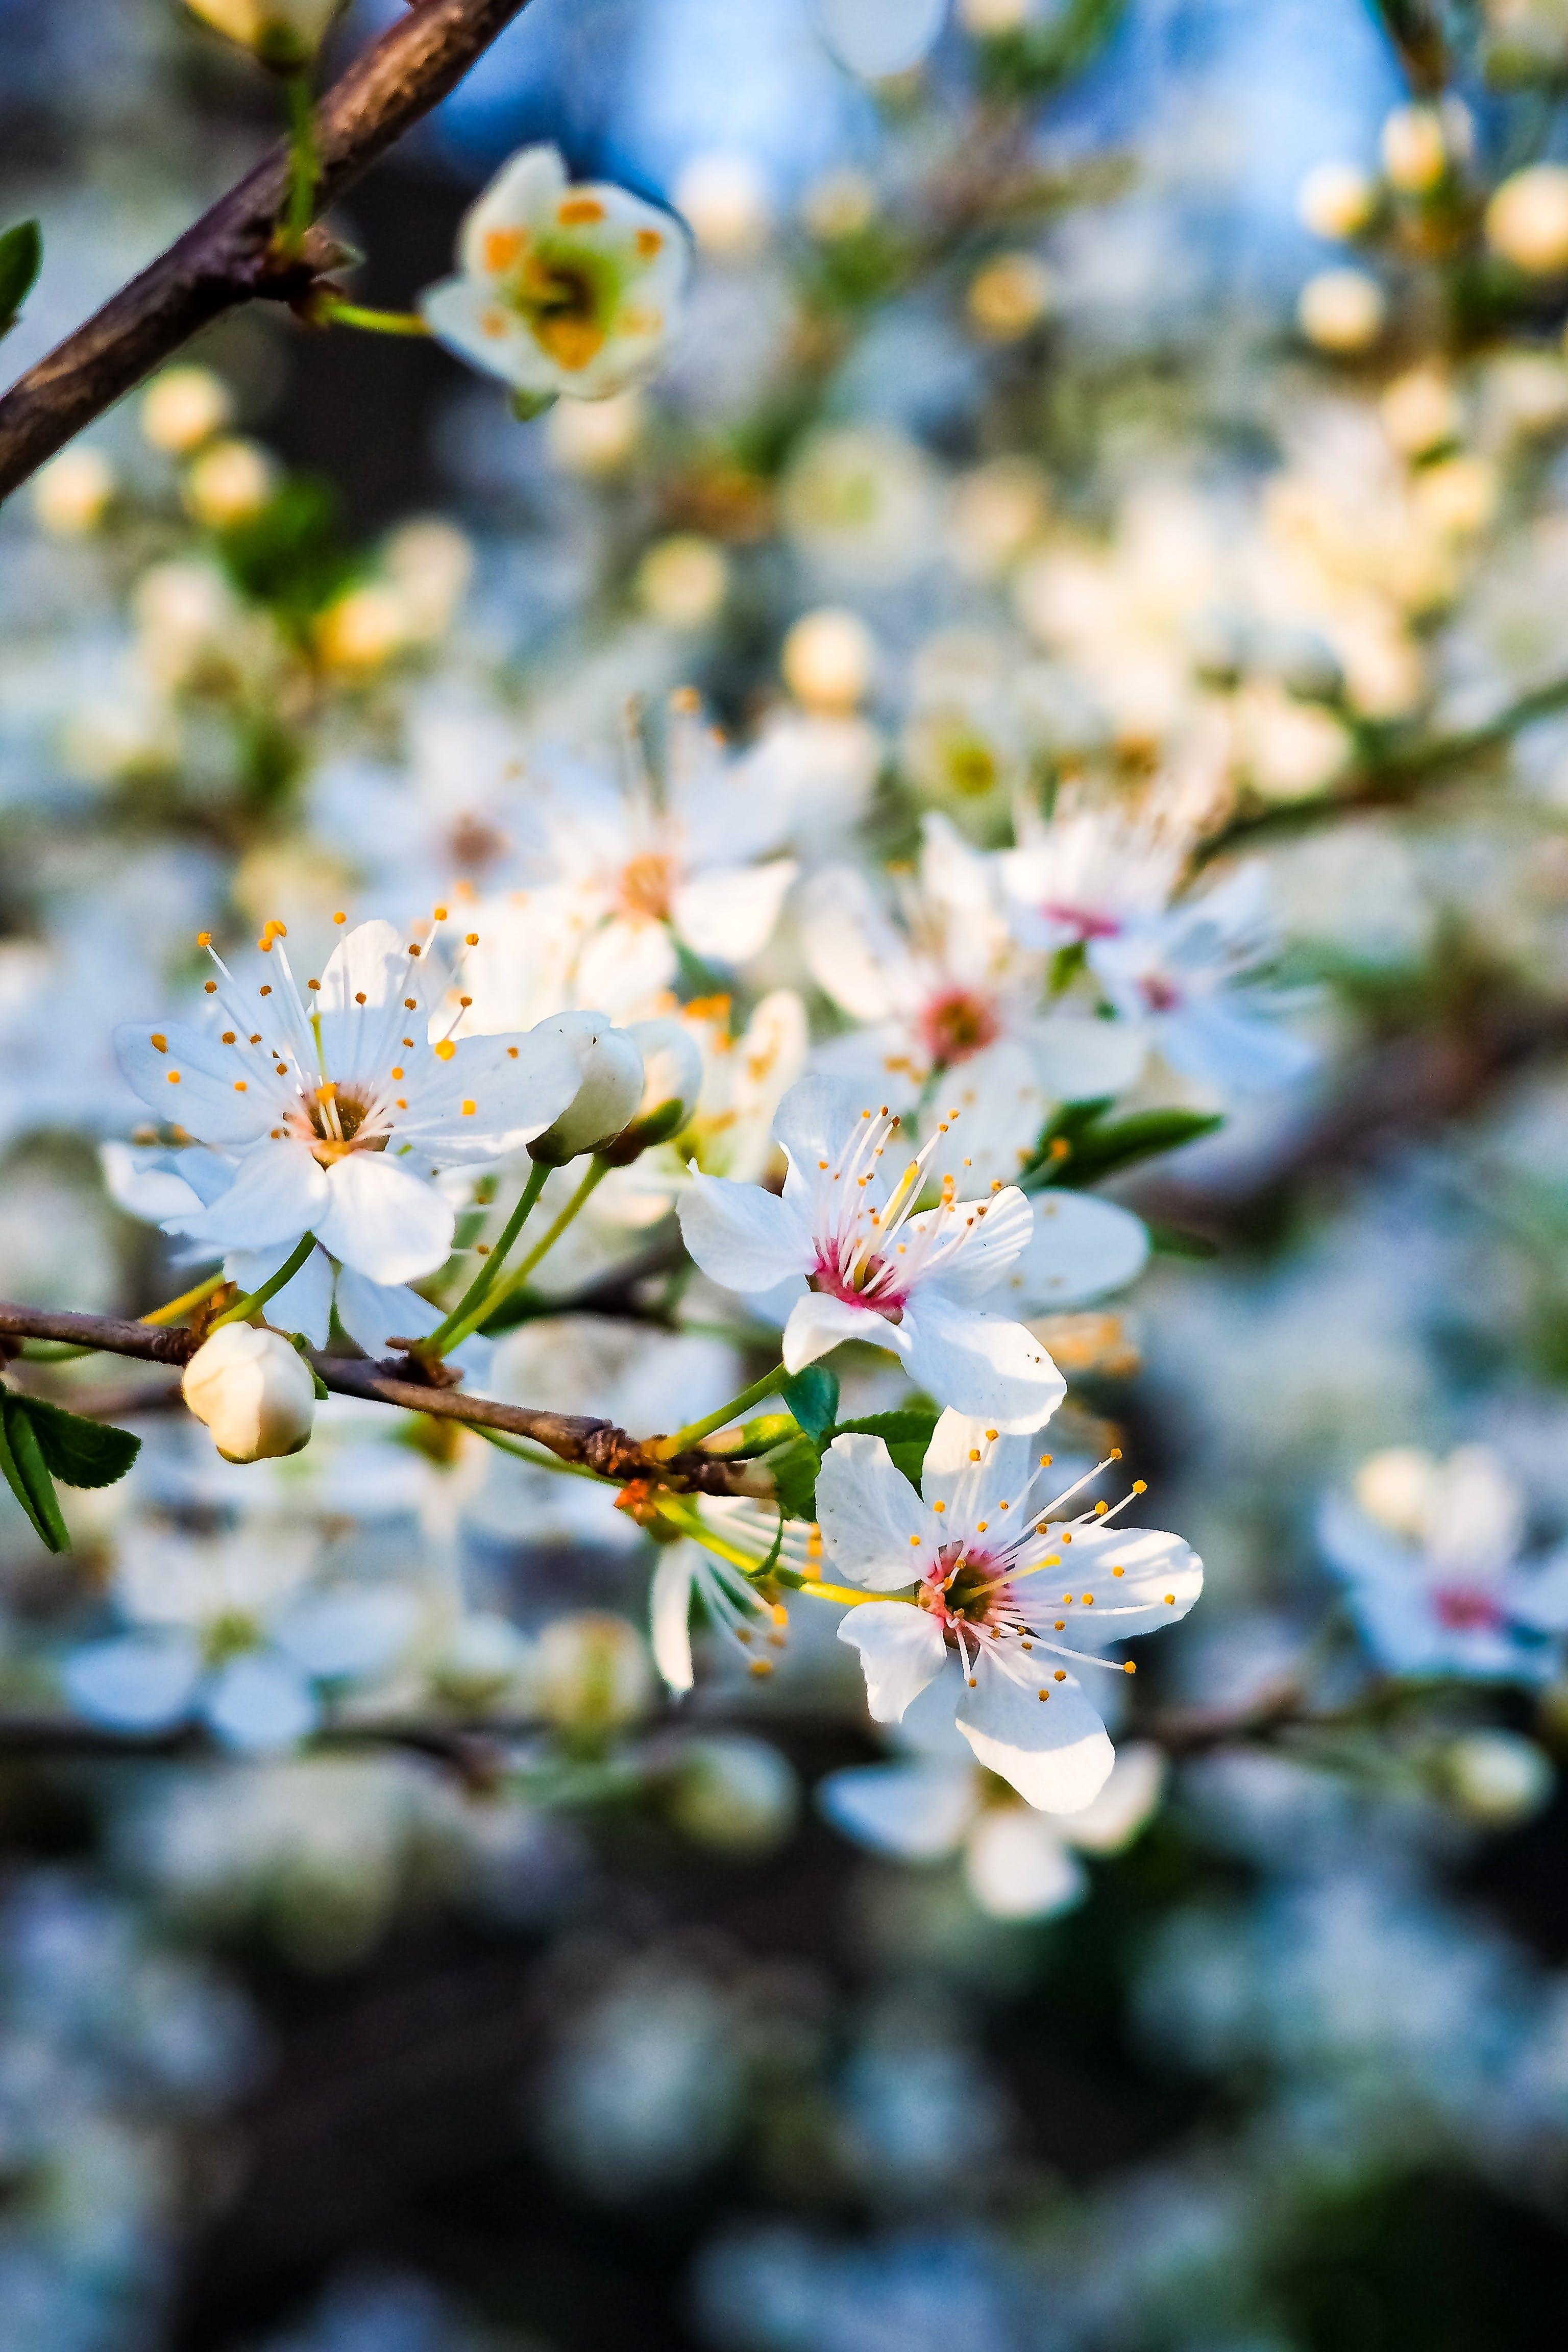 Free stock photo of bloom, blossom, branch, cherry blossom